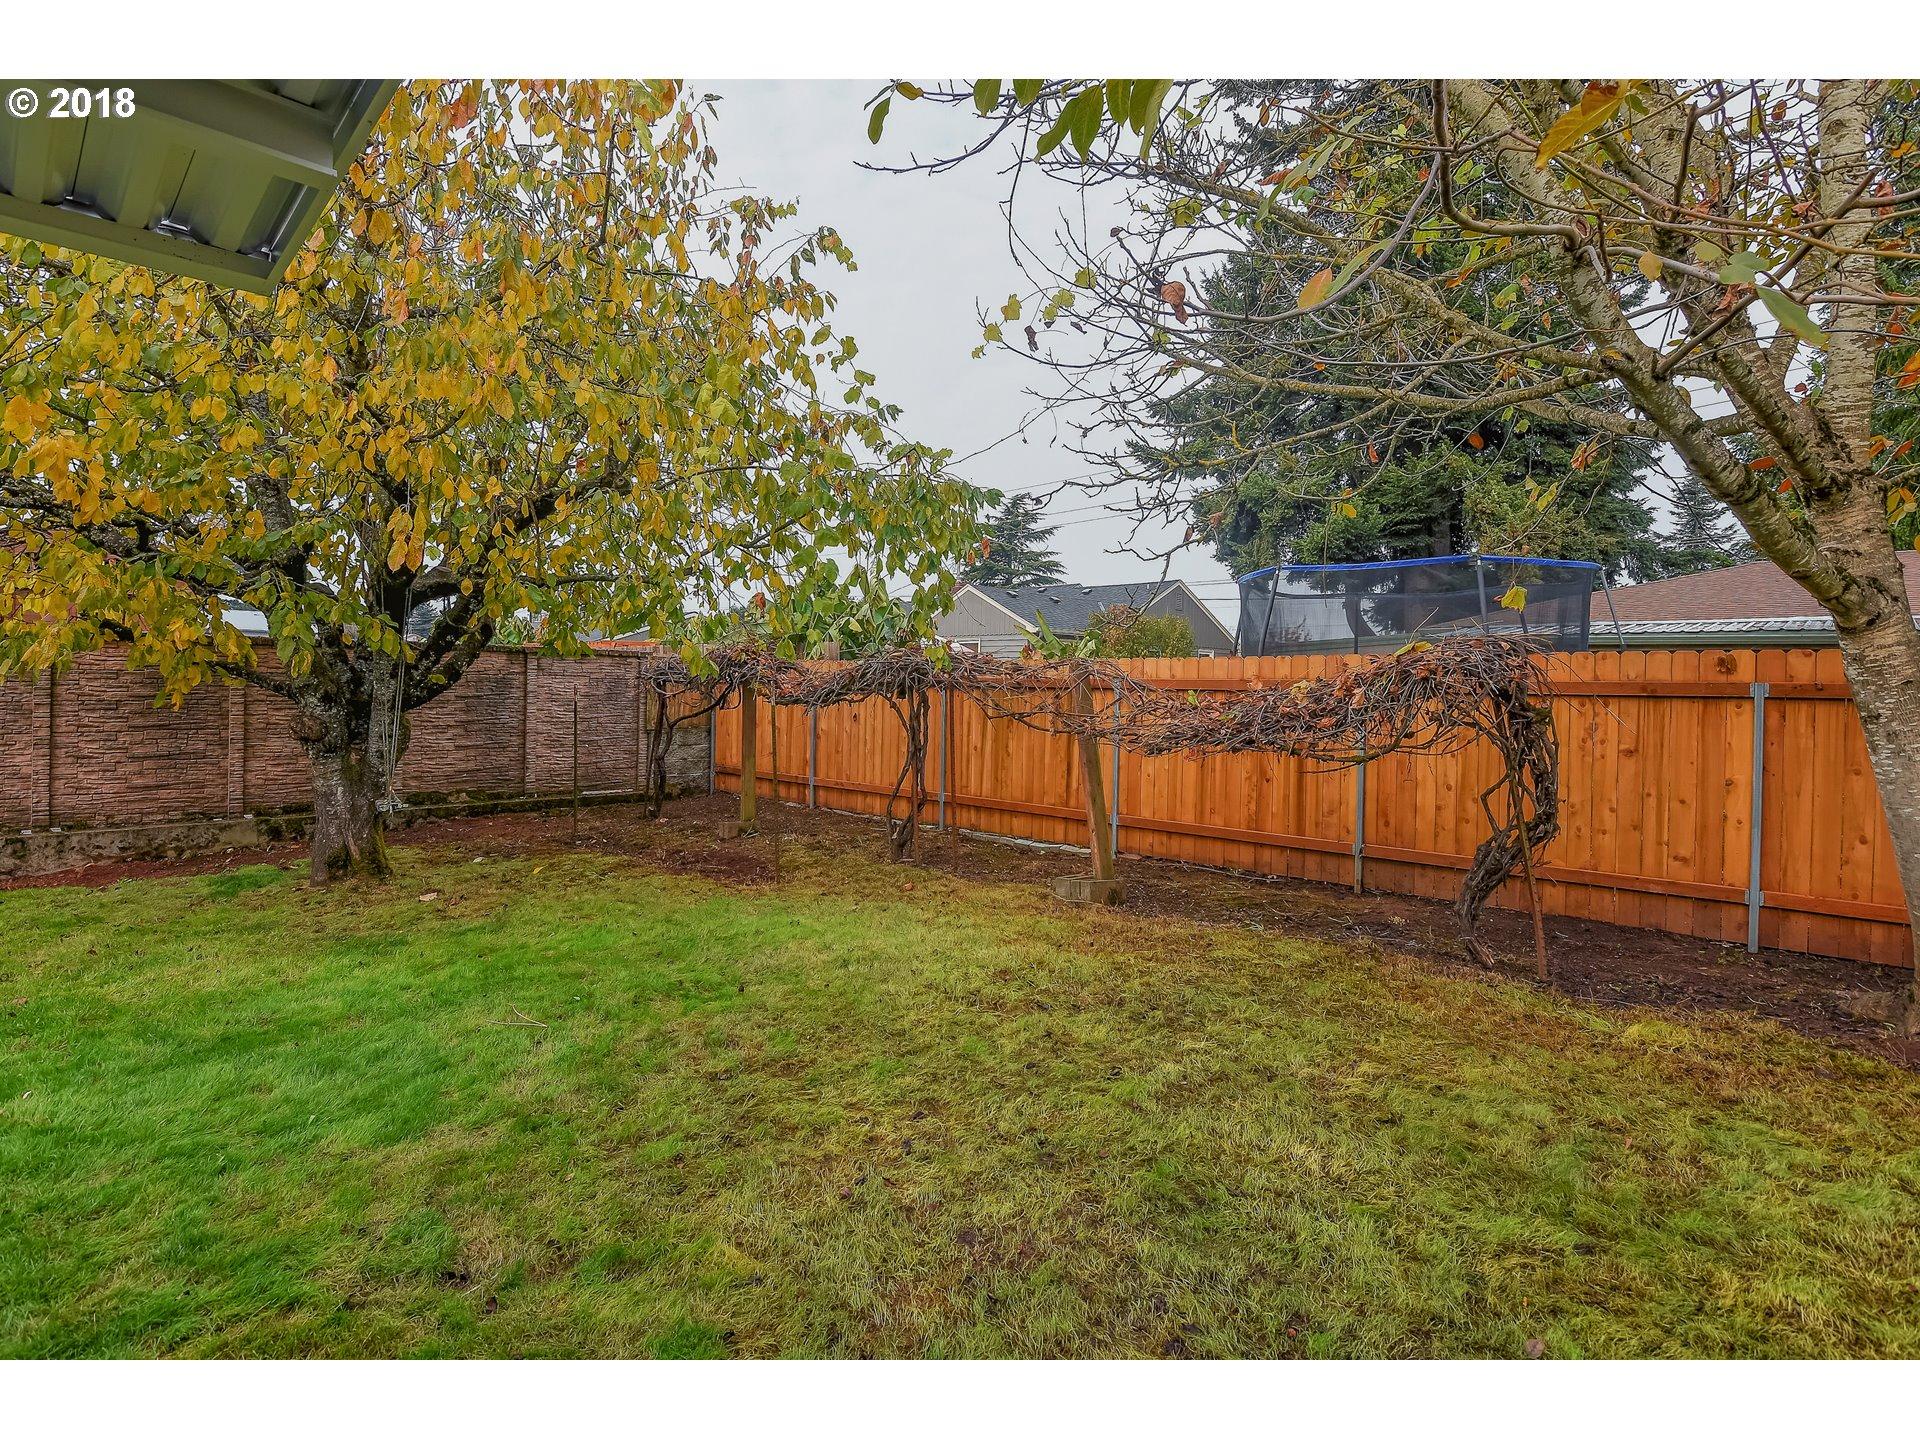 7704 NE 61ST AVE Vancouver, WA 98661 - MLS #: 18037442